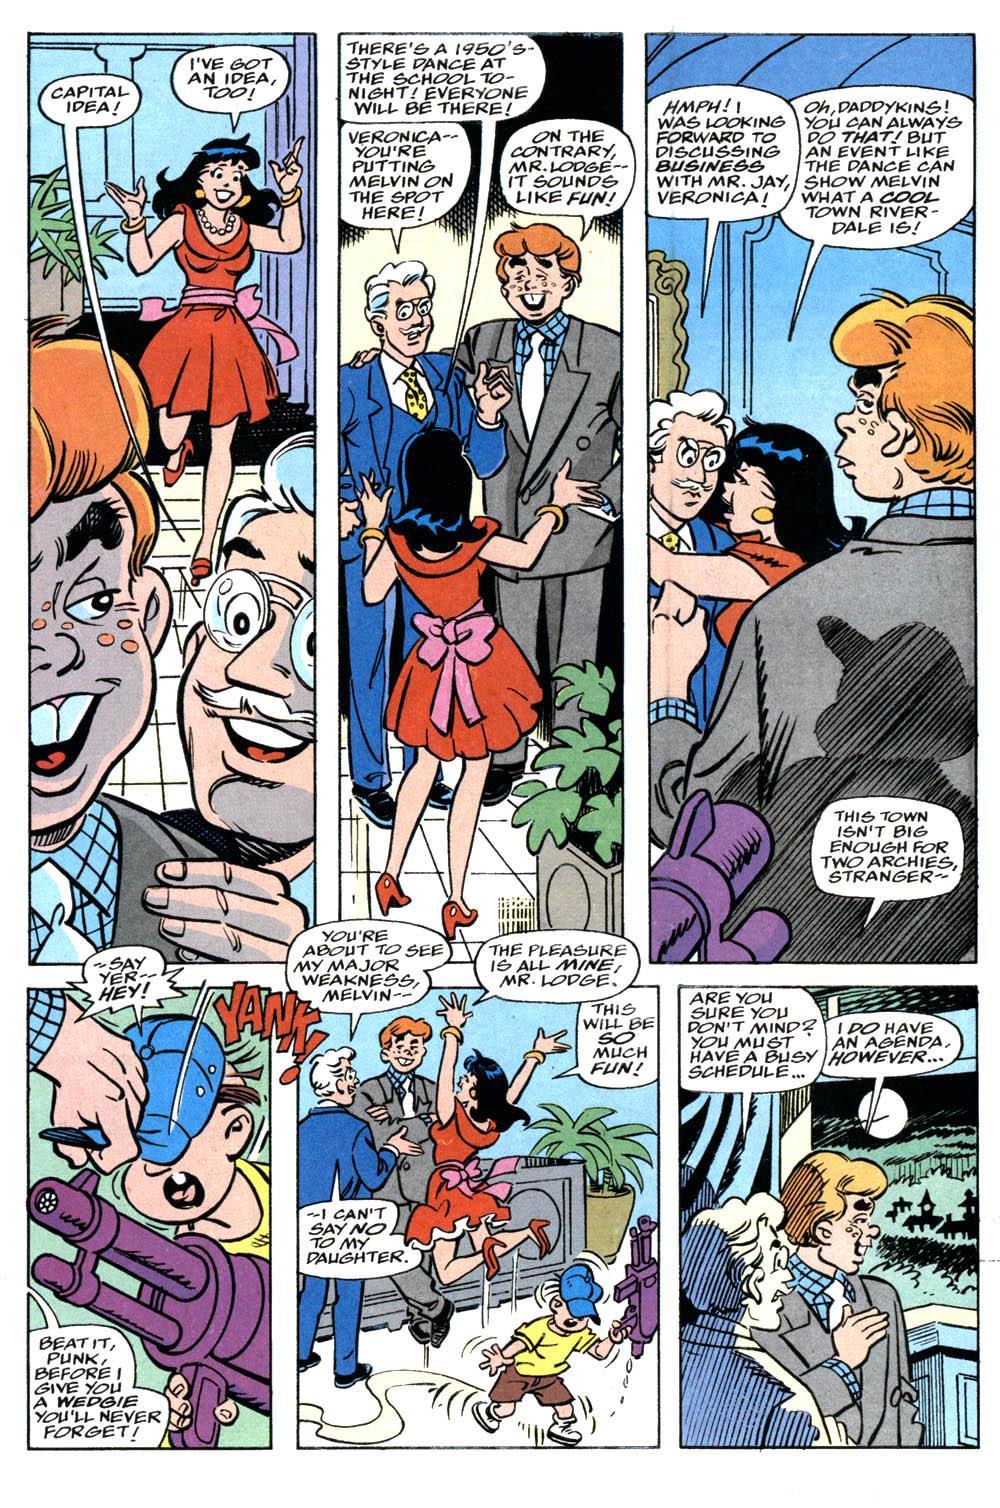 betty and veronica meet the punisher war